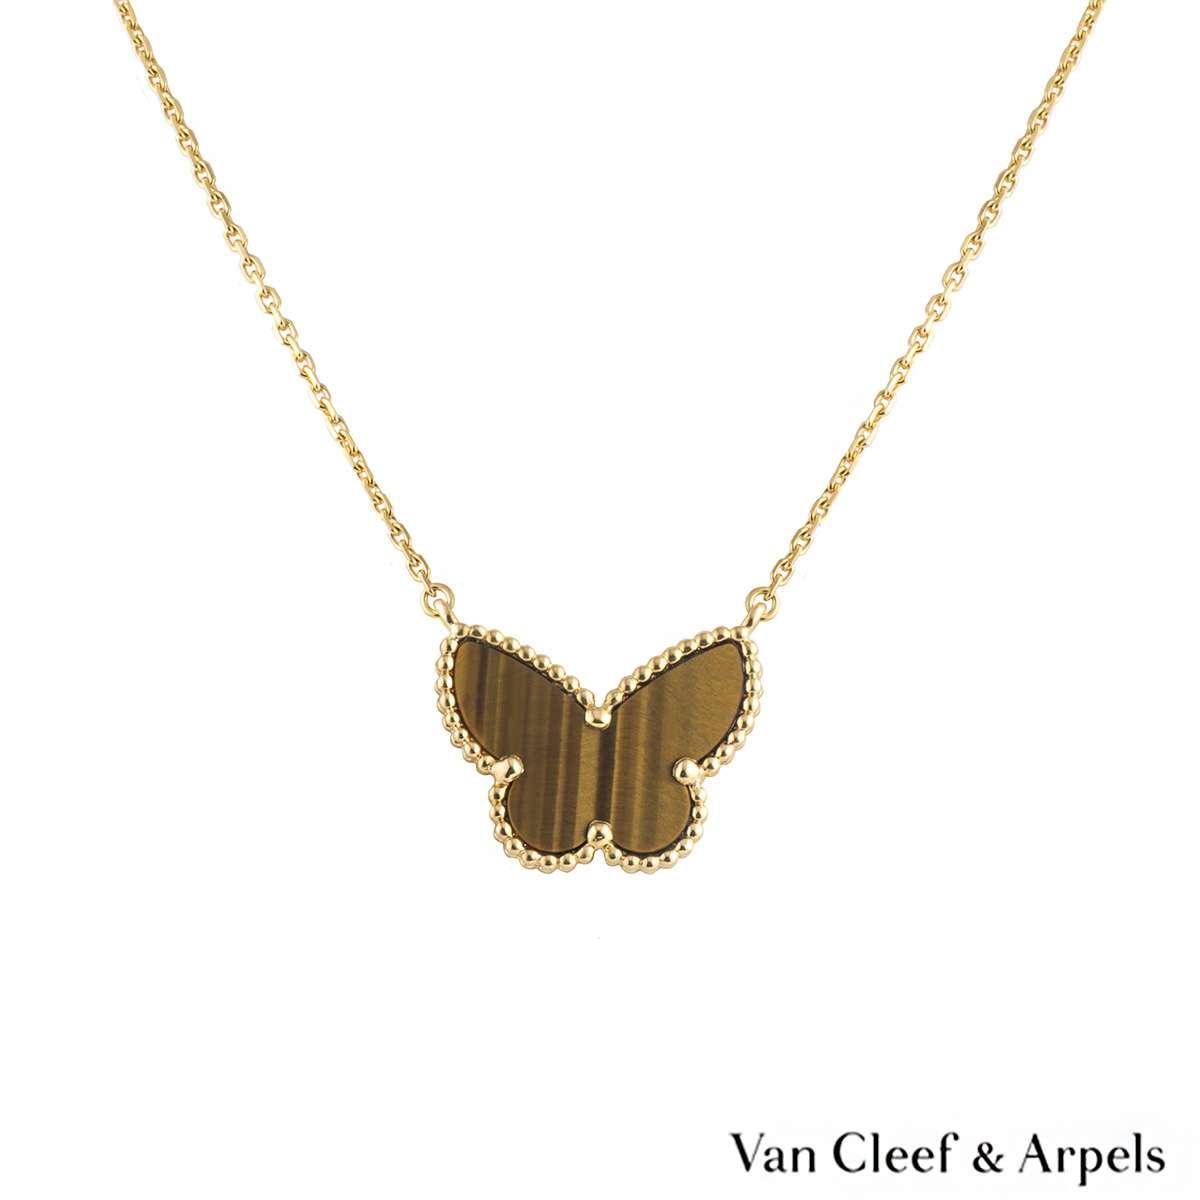 Van Cleef & Arpels Lucky Alhambra Butterfly Pendant